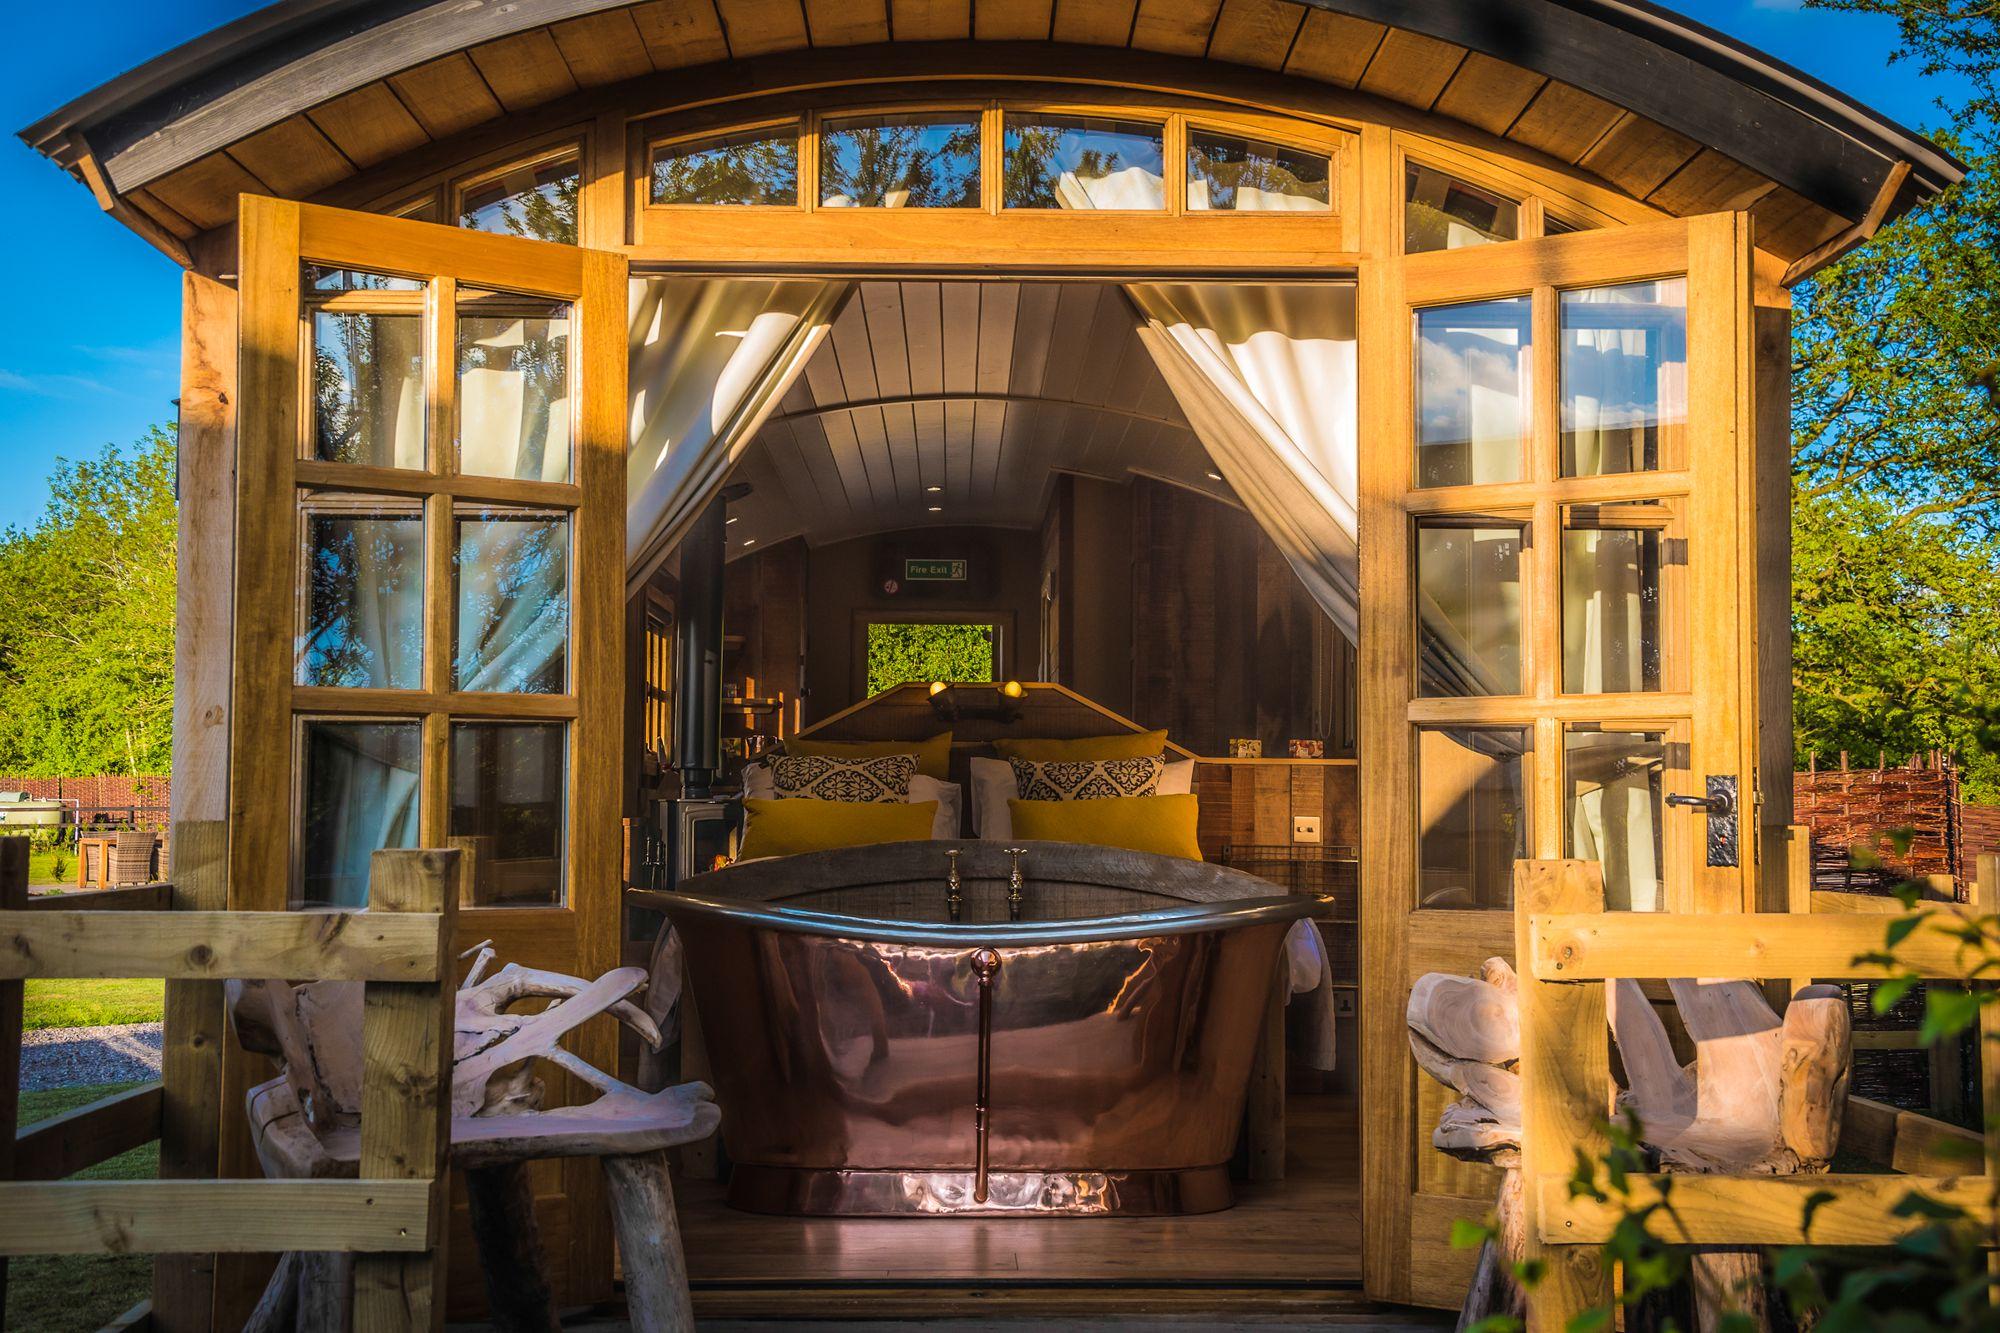 Ockeridge Rural Retreats